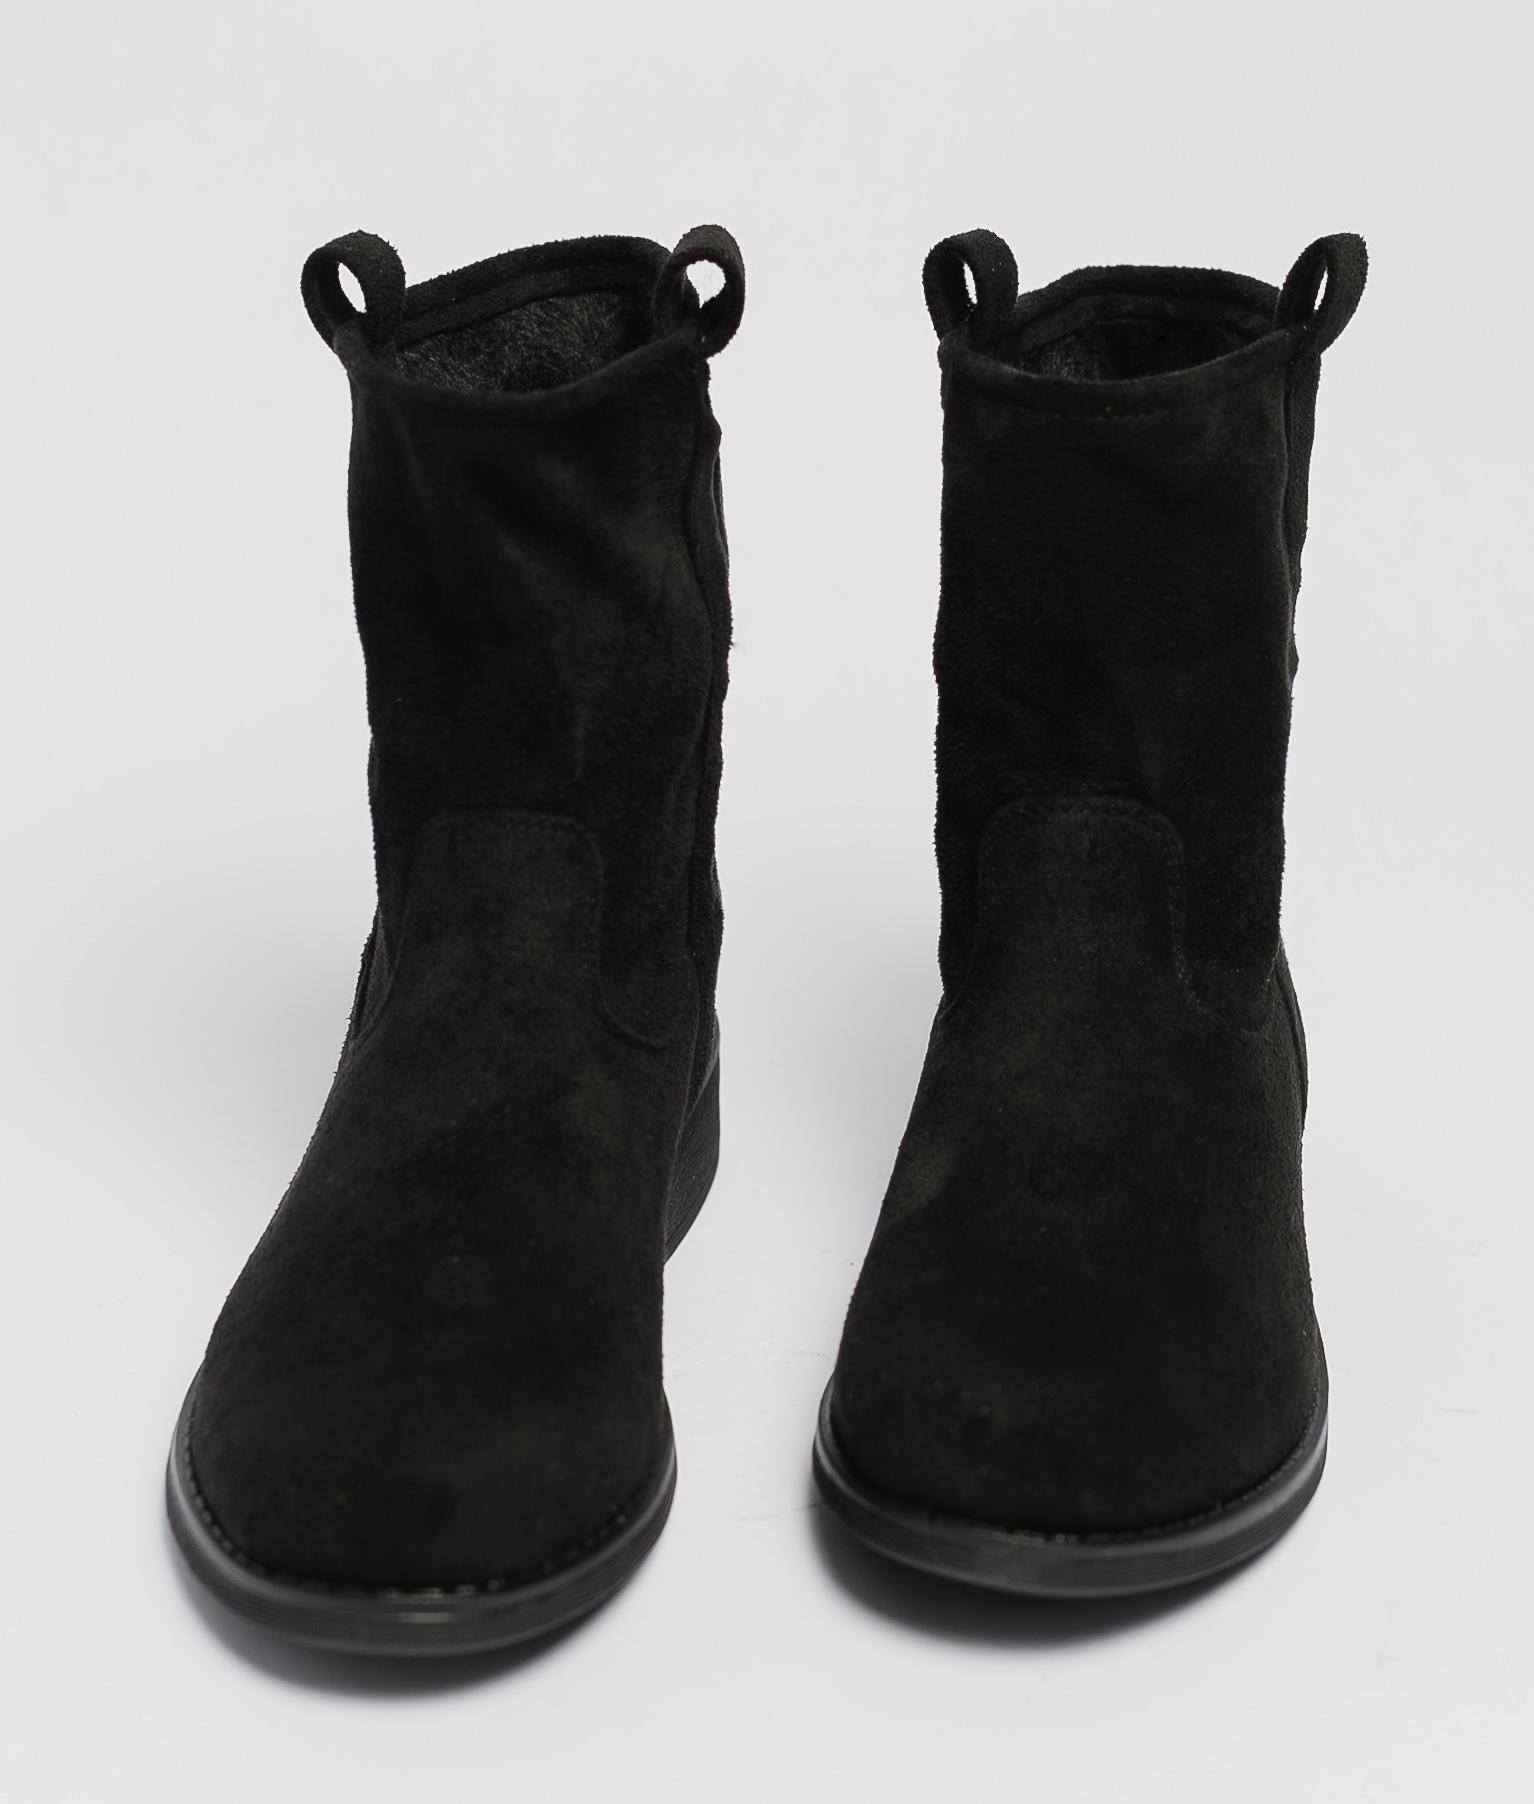 Mirea Low Boot - Black